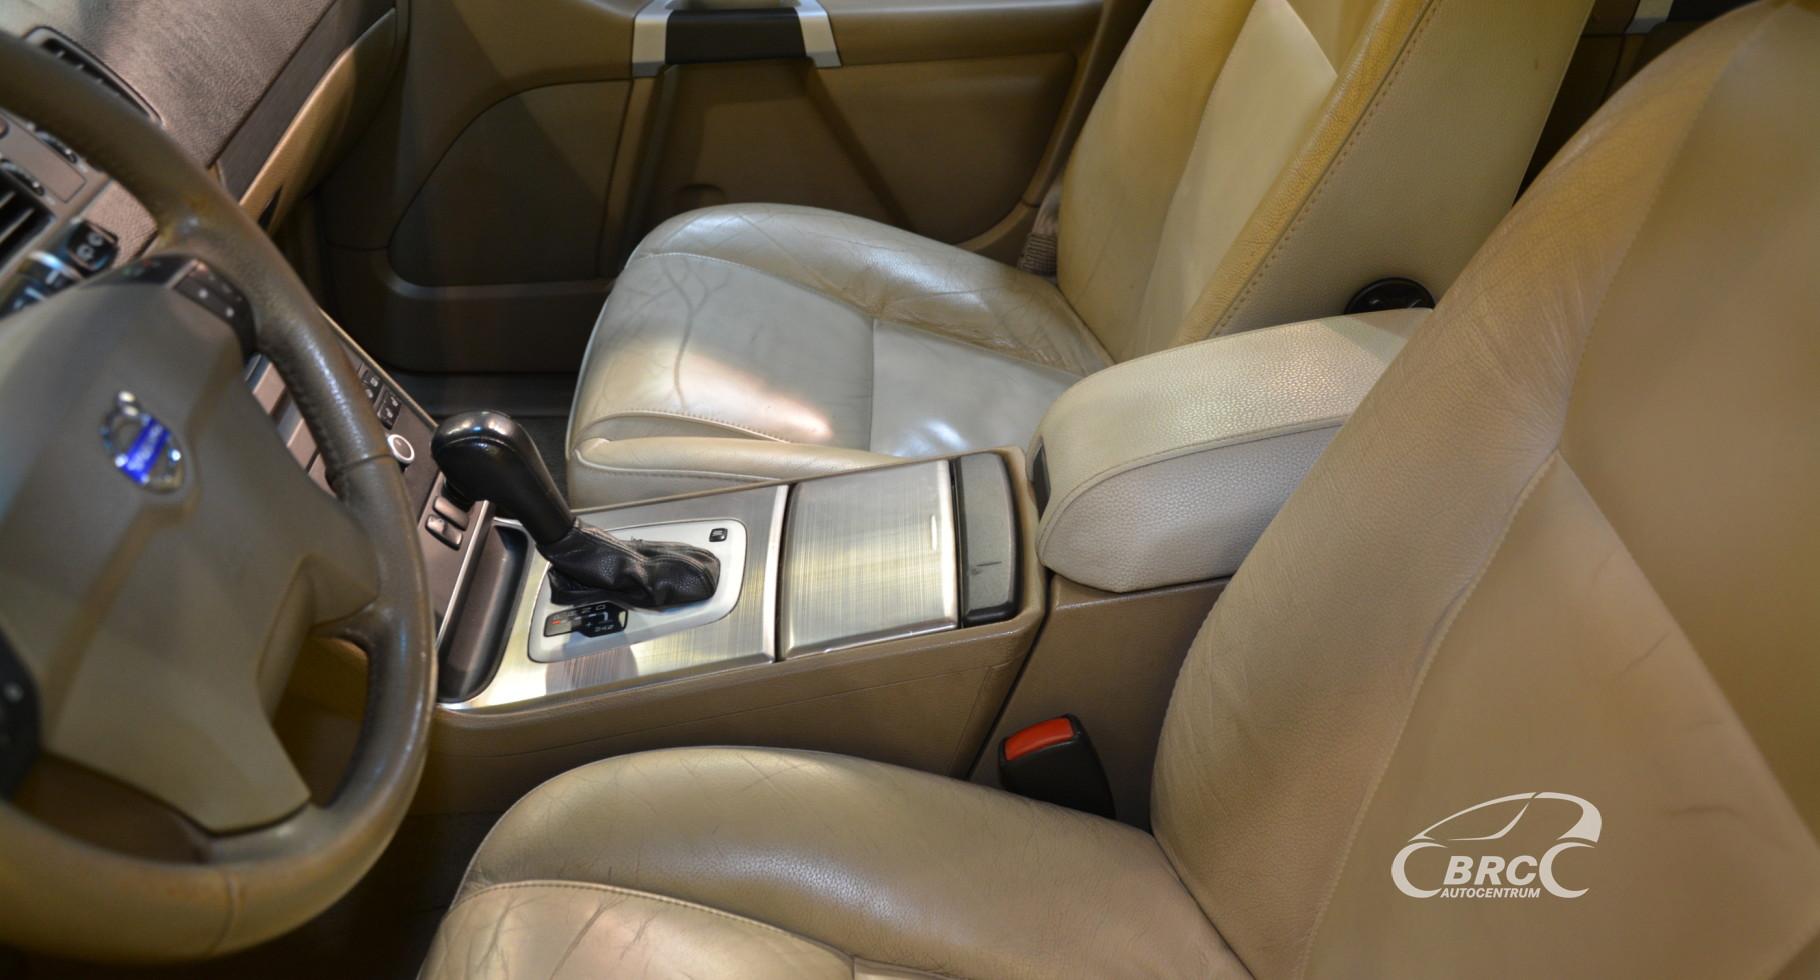 Volvo XC 90 2.4 D5 AWD Automatas